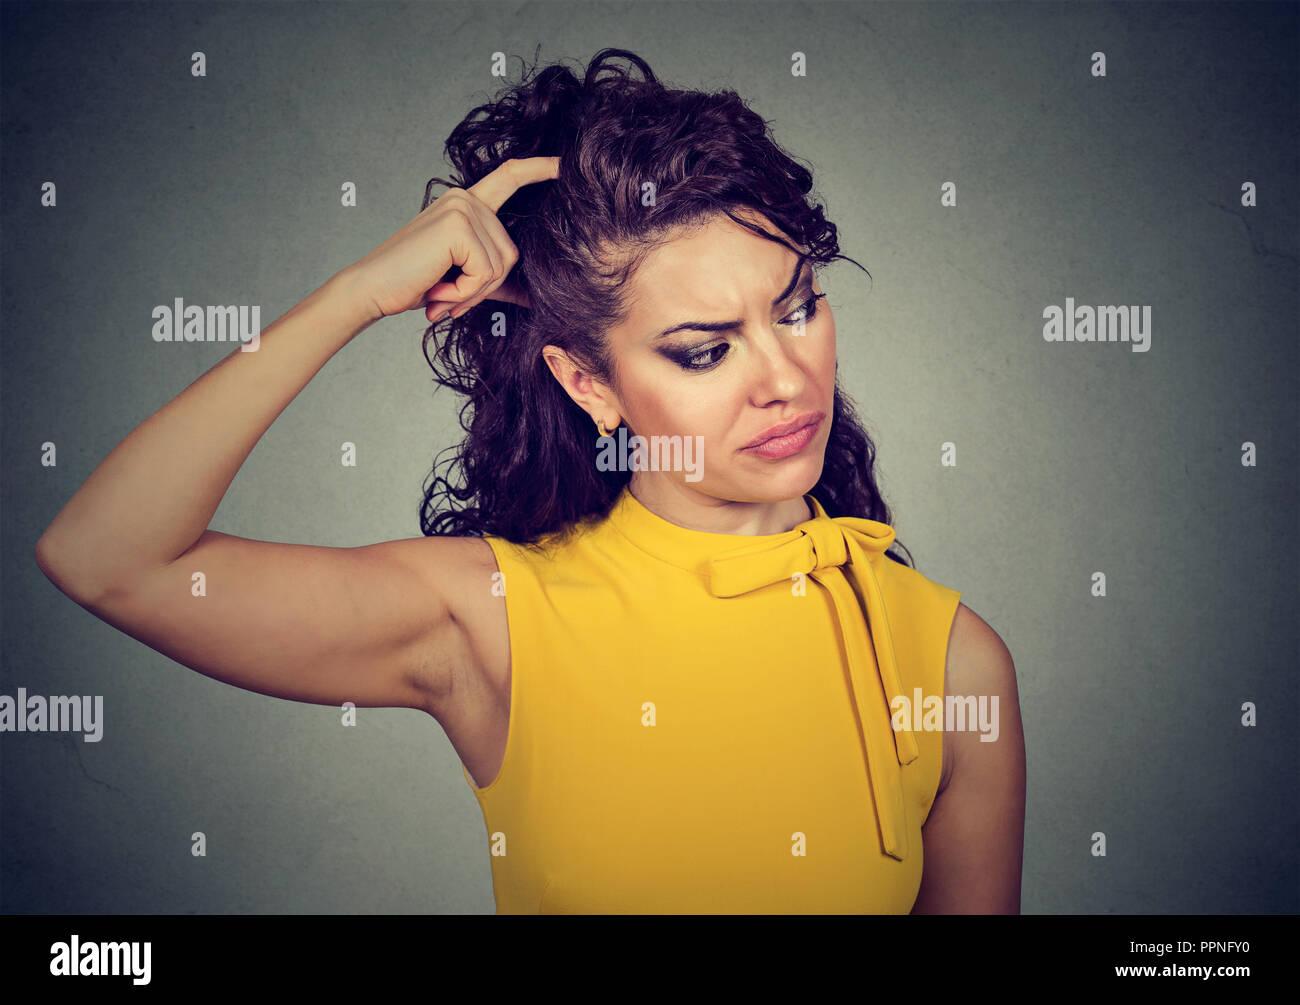 Jeune femme brune perplexe robe jaune en se grattant la tête dans perplexion looking away Photo Stock